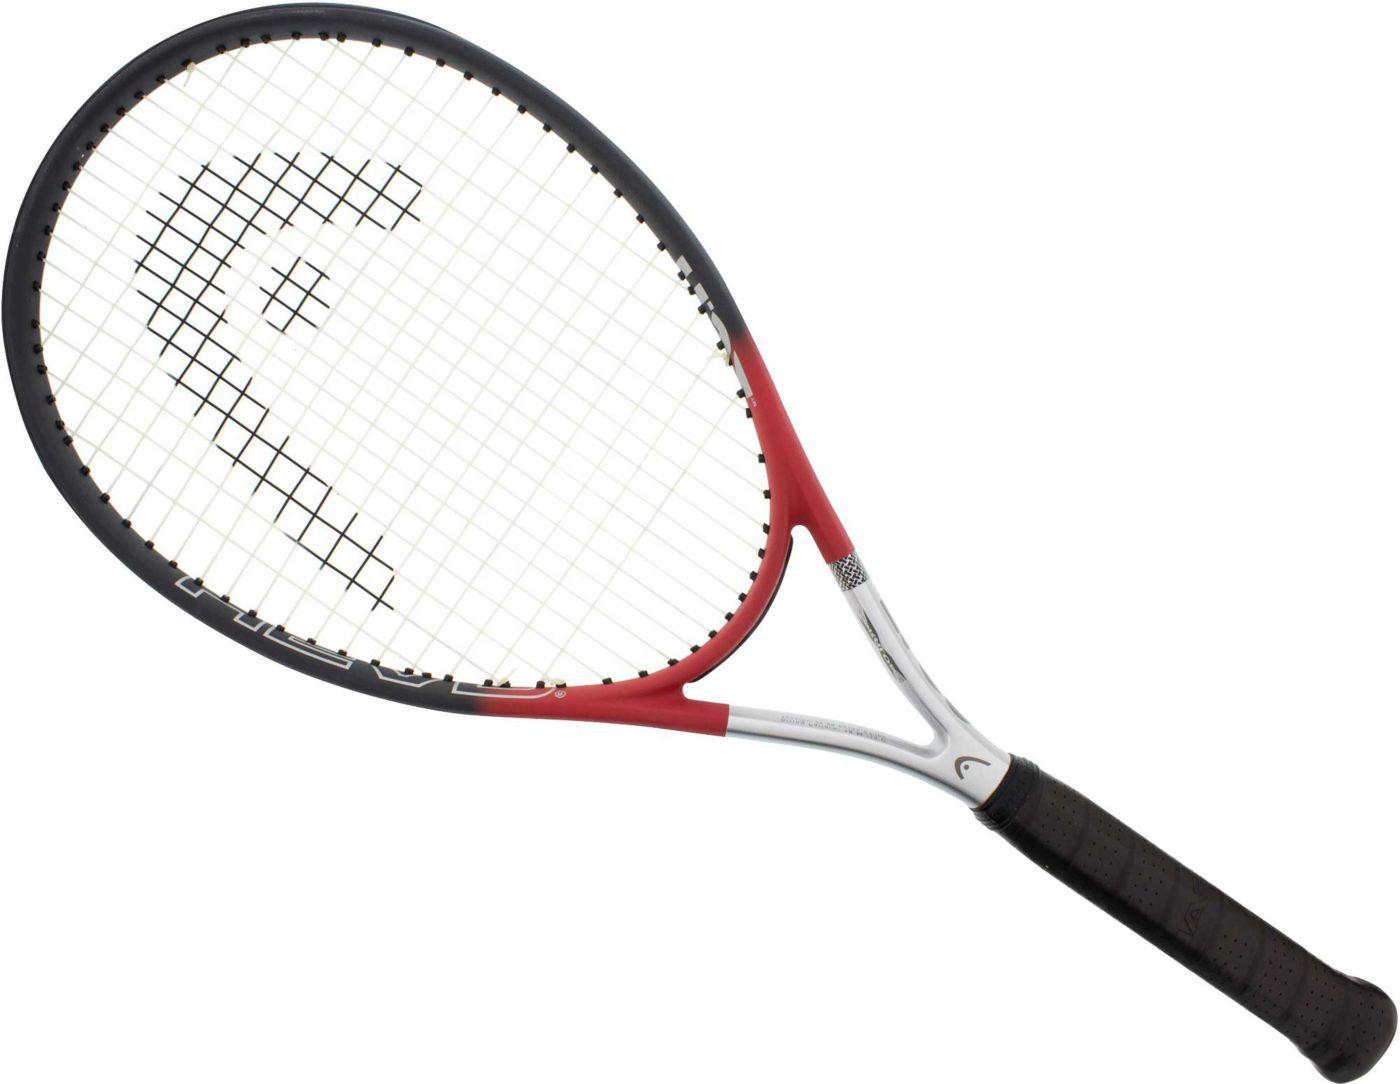 Head TiS2 Tennis Racquet